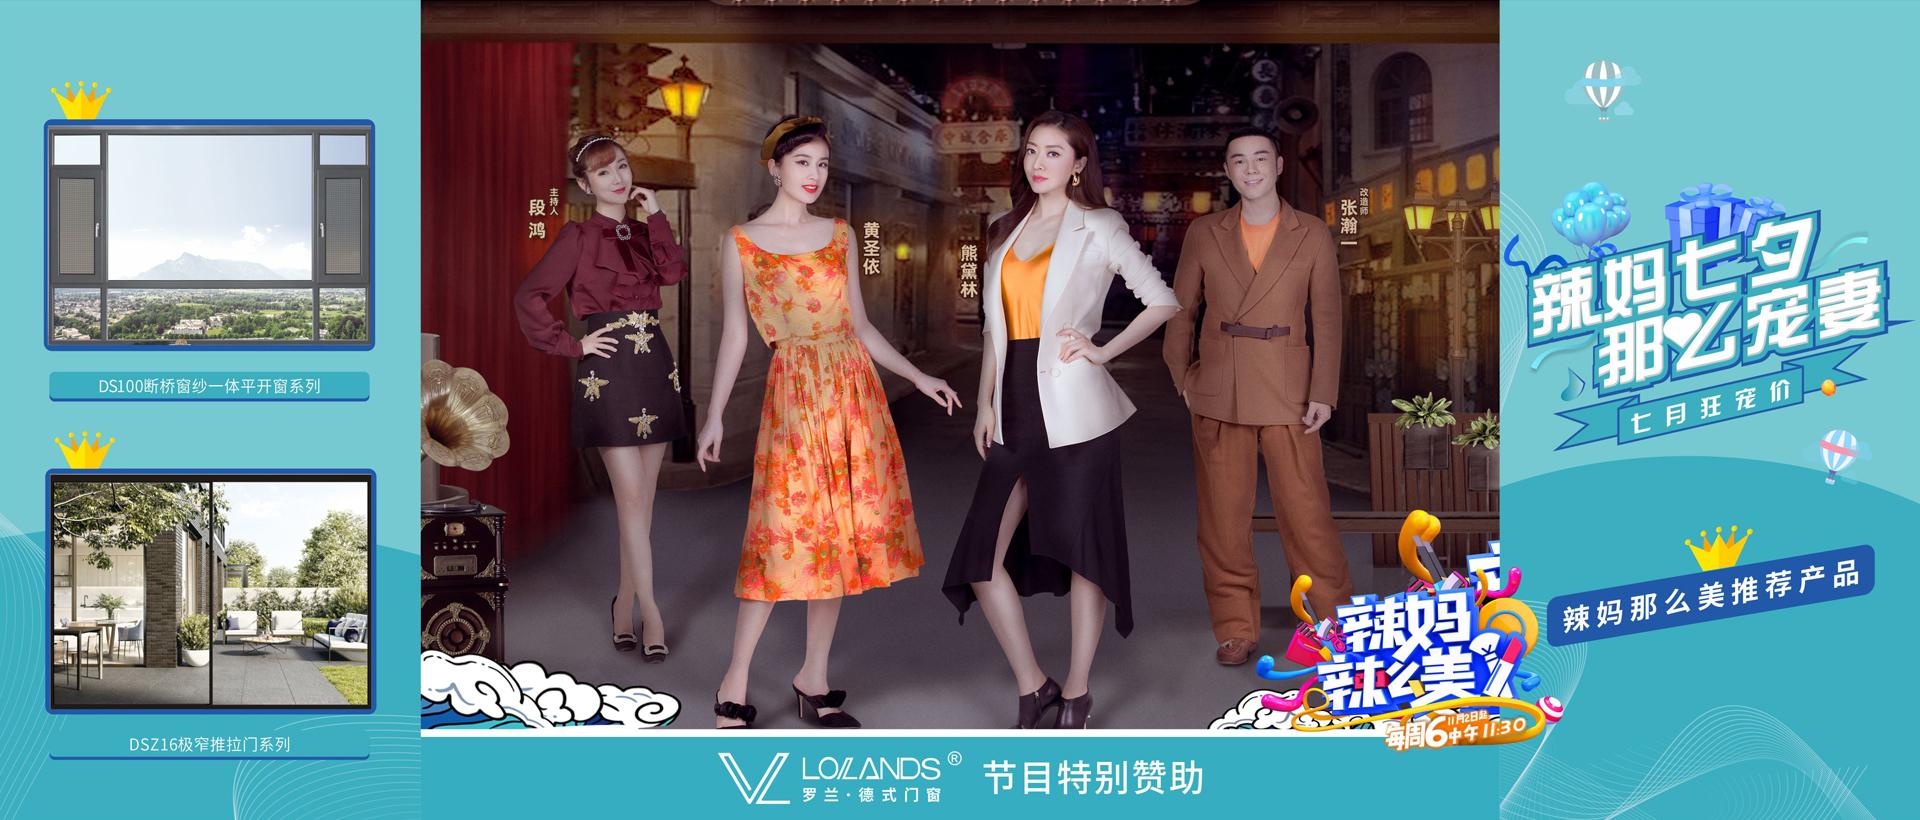 LOLANDS罗兰德式品牌特别赞助《辣妈辣么美》开启宁静生活